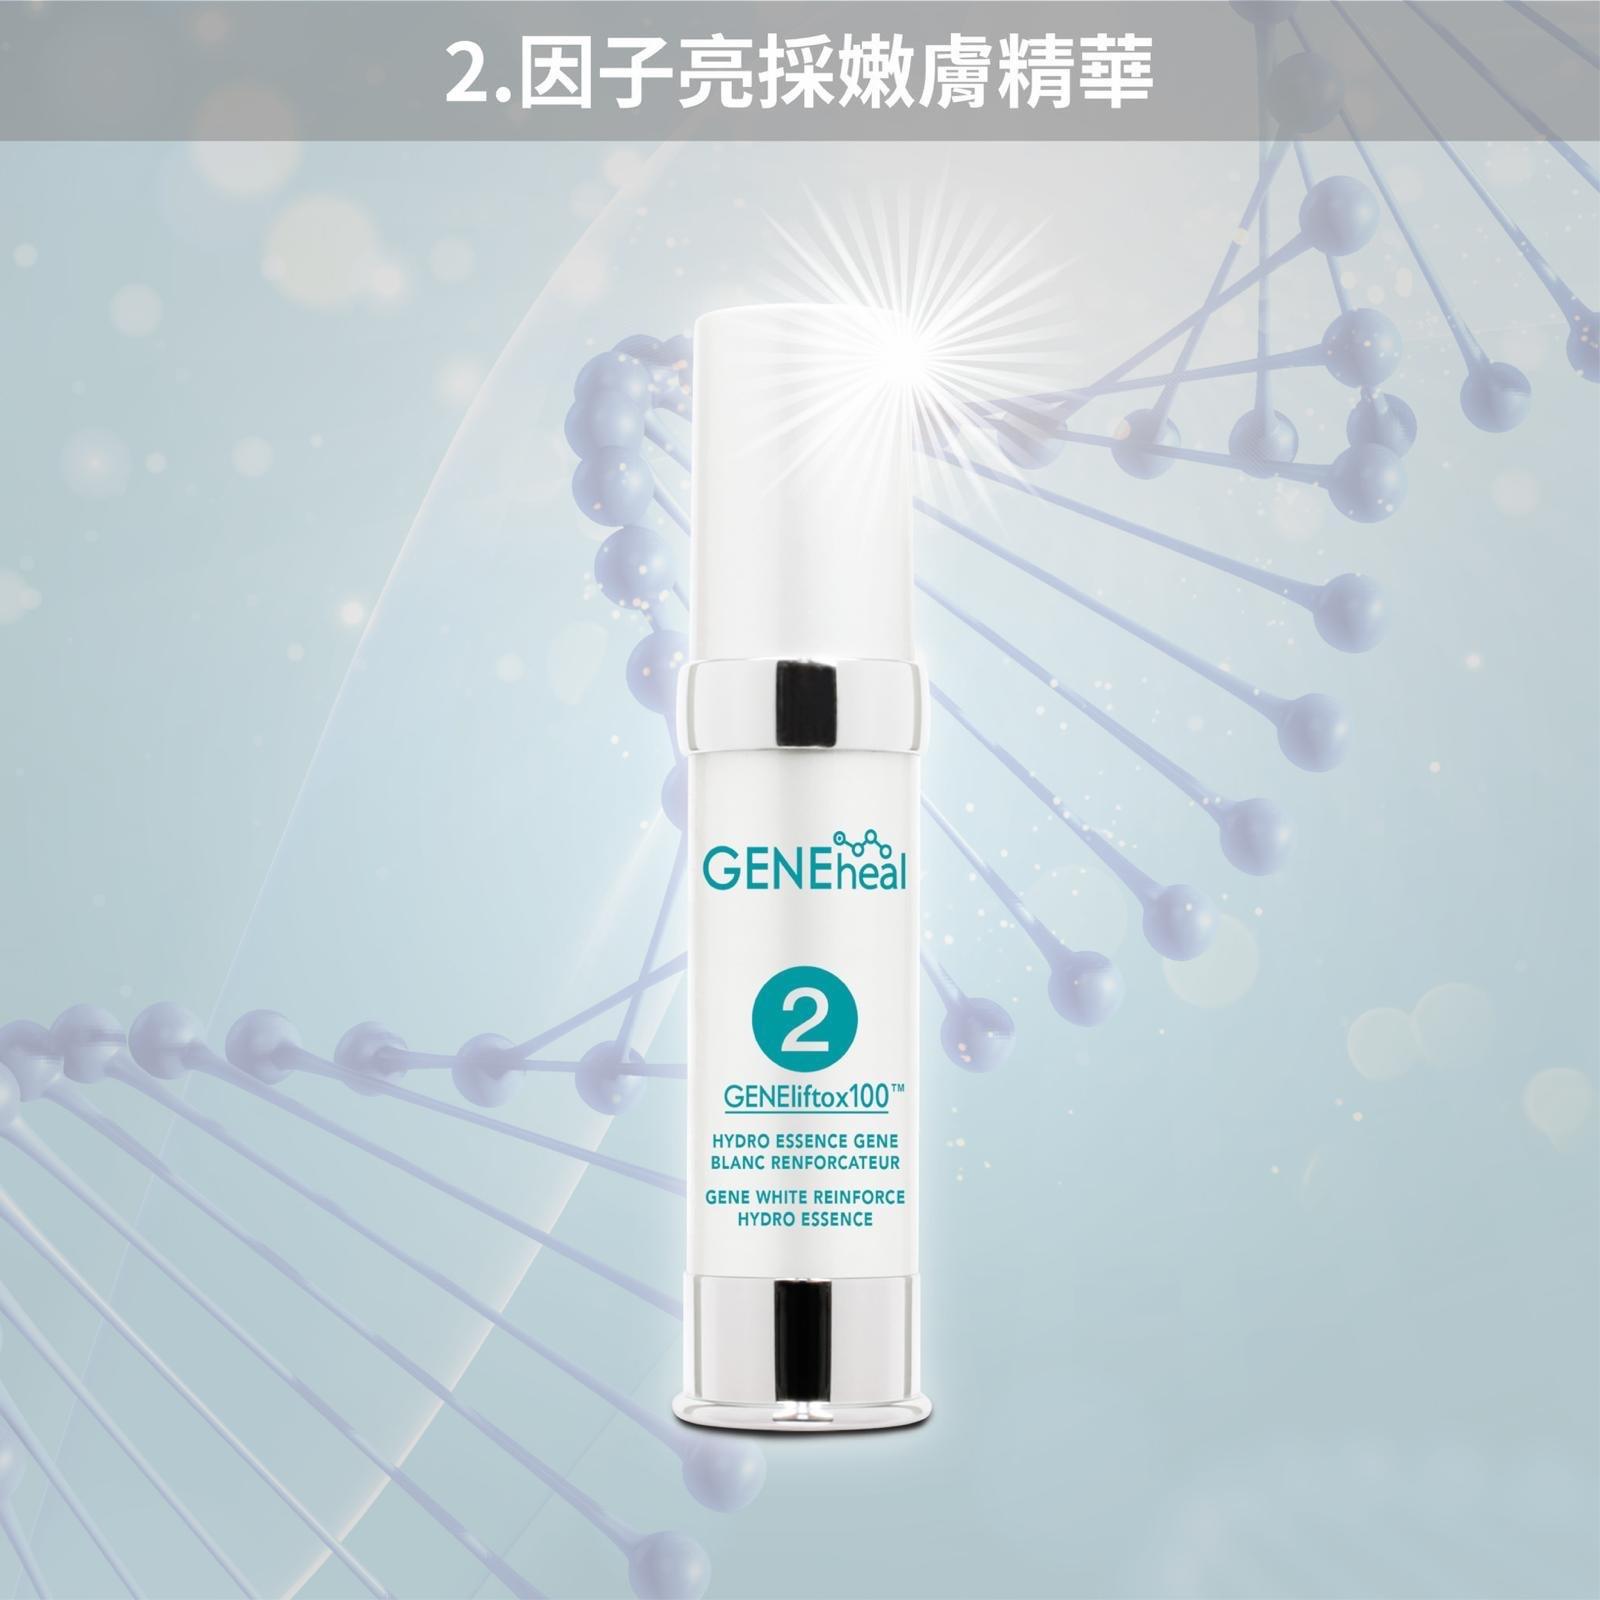 GENEheal 三週奇蹟「加強・升級・亮澤青春方案」《Roseann 愛心推介》